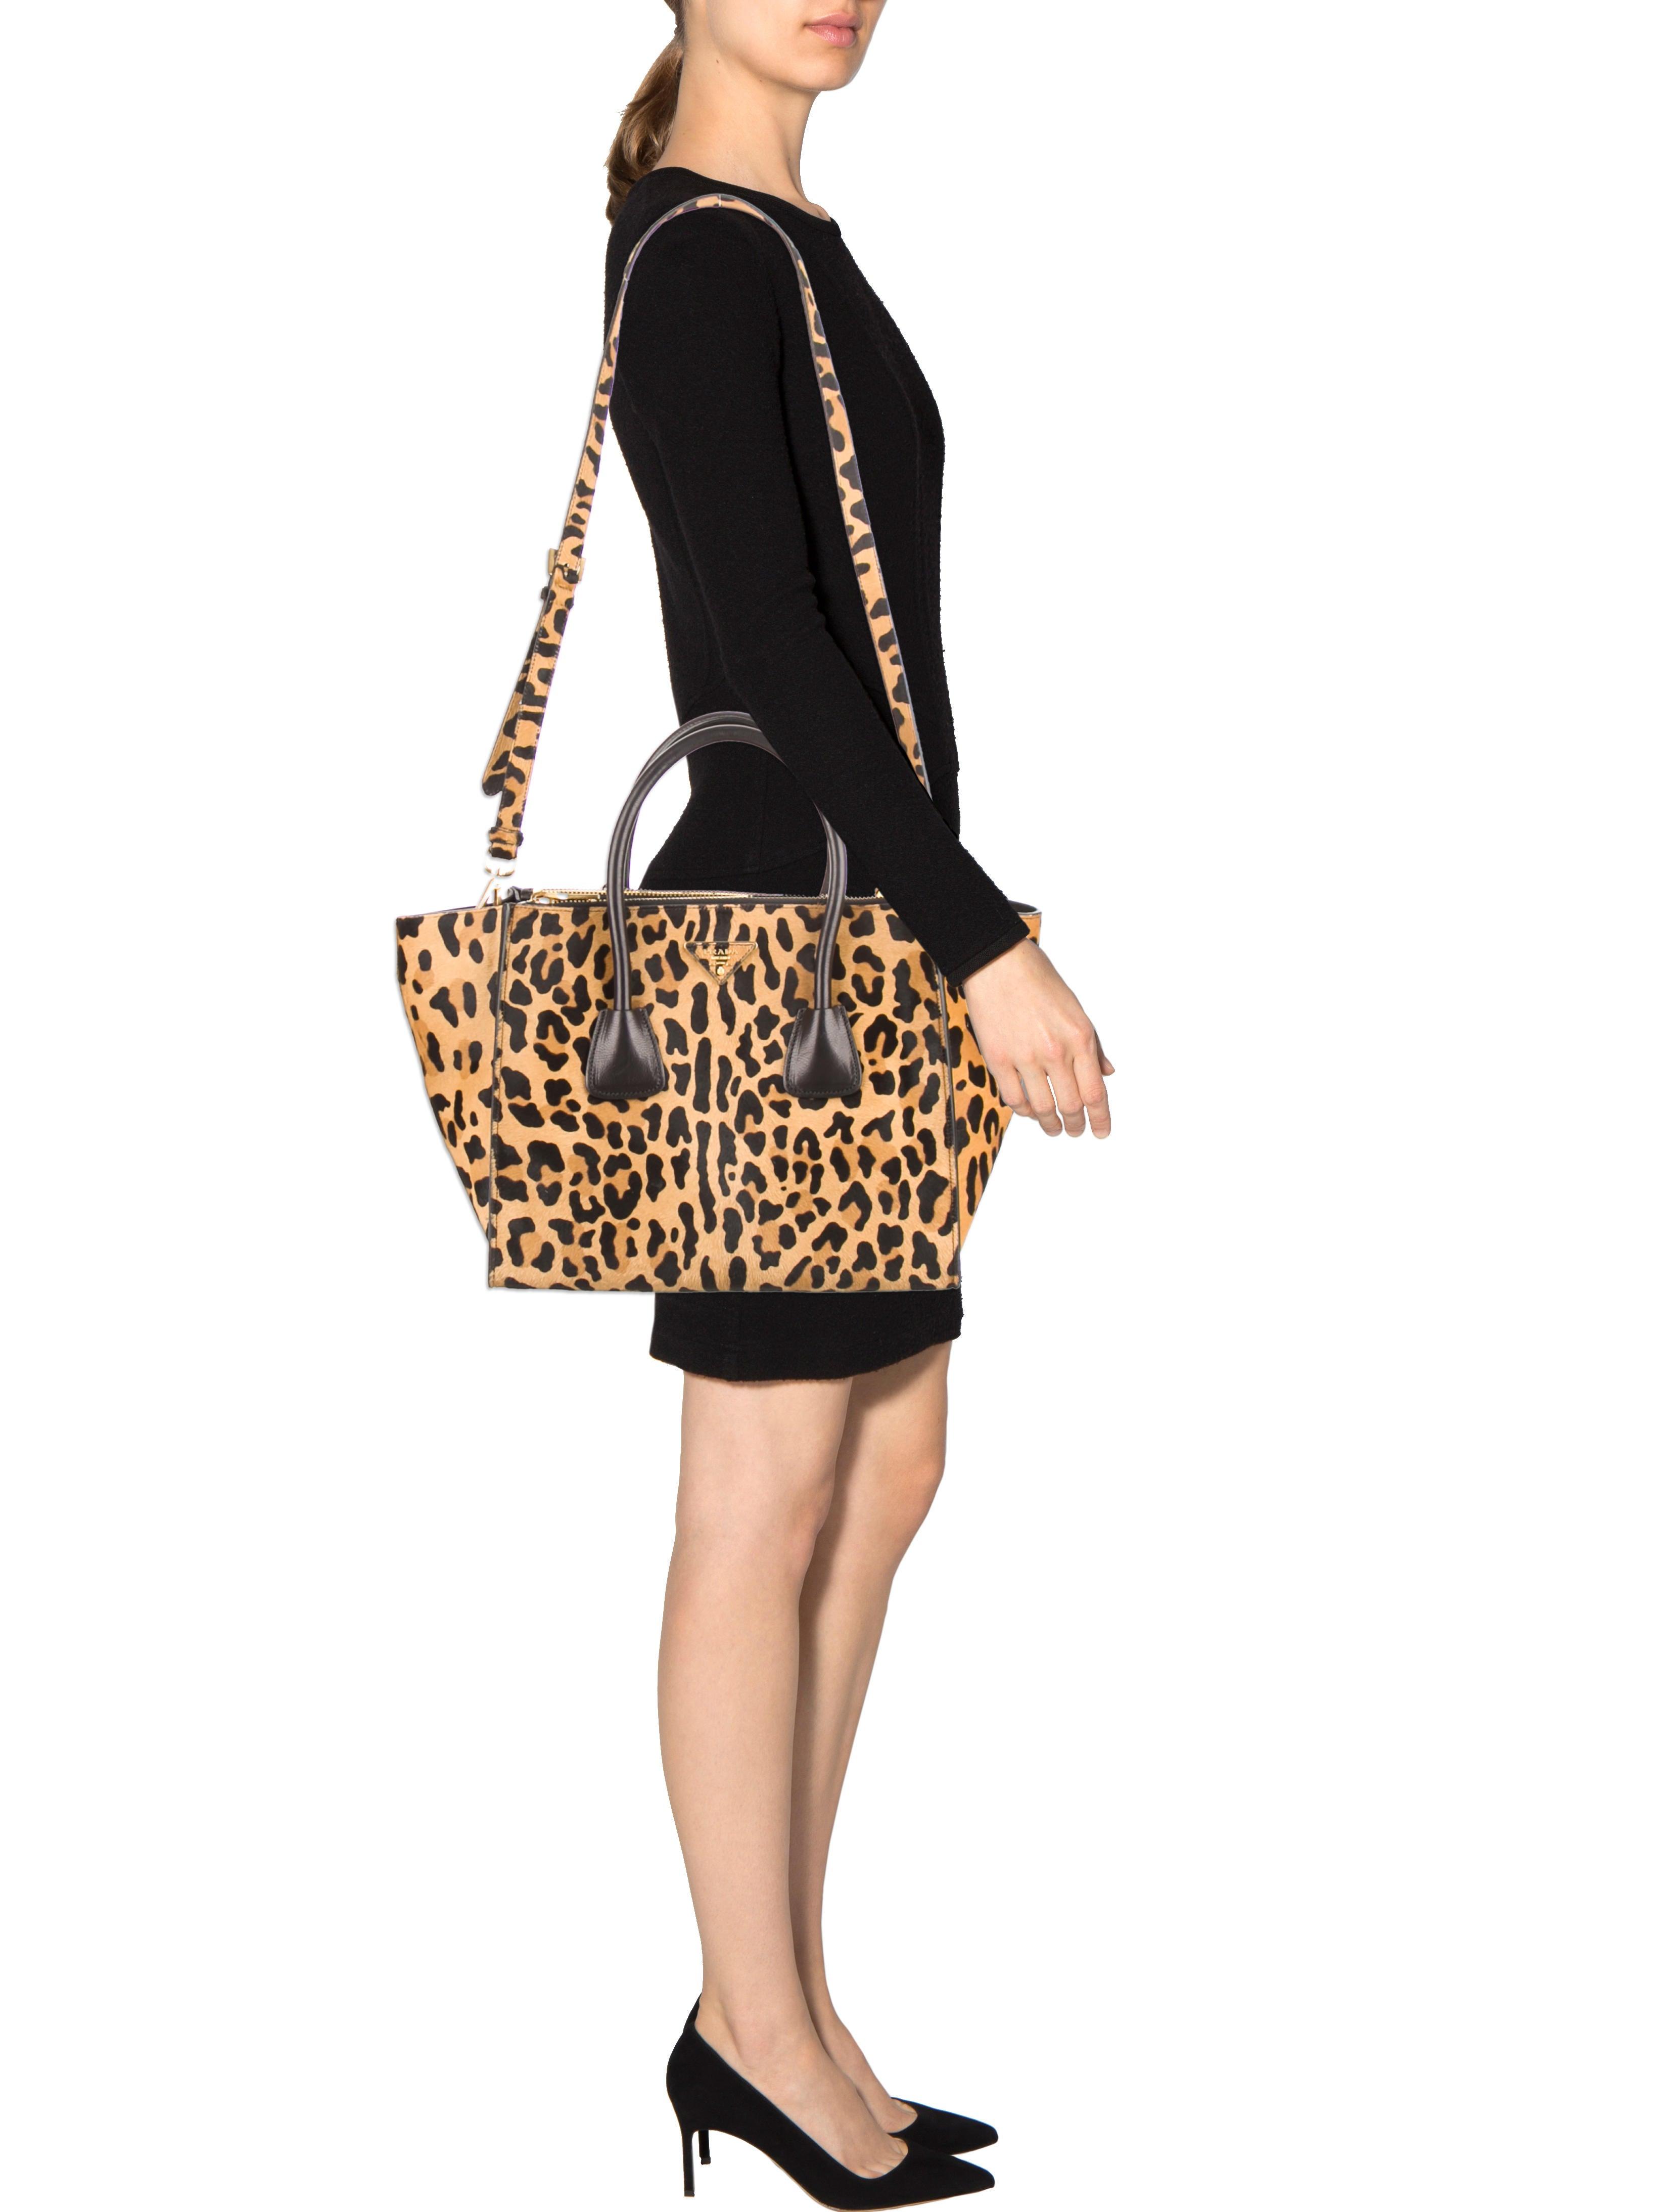 prada saffiano tote pink - Prada Ponyhair Double Zip Tote - Handbags - PRA85410 | The RealReal